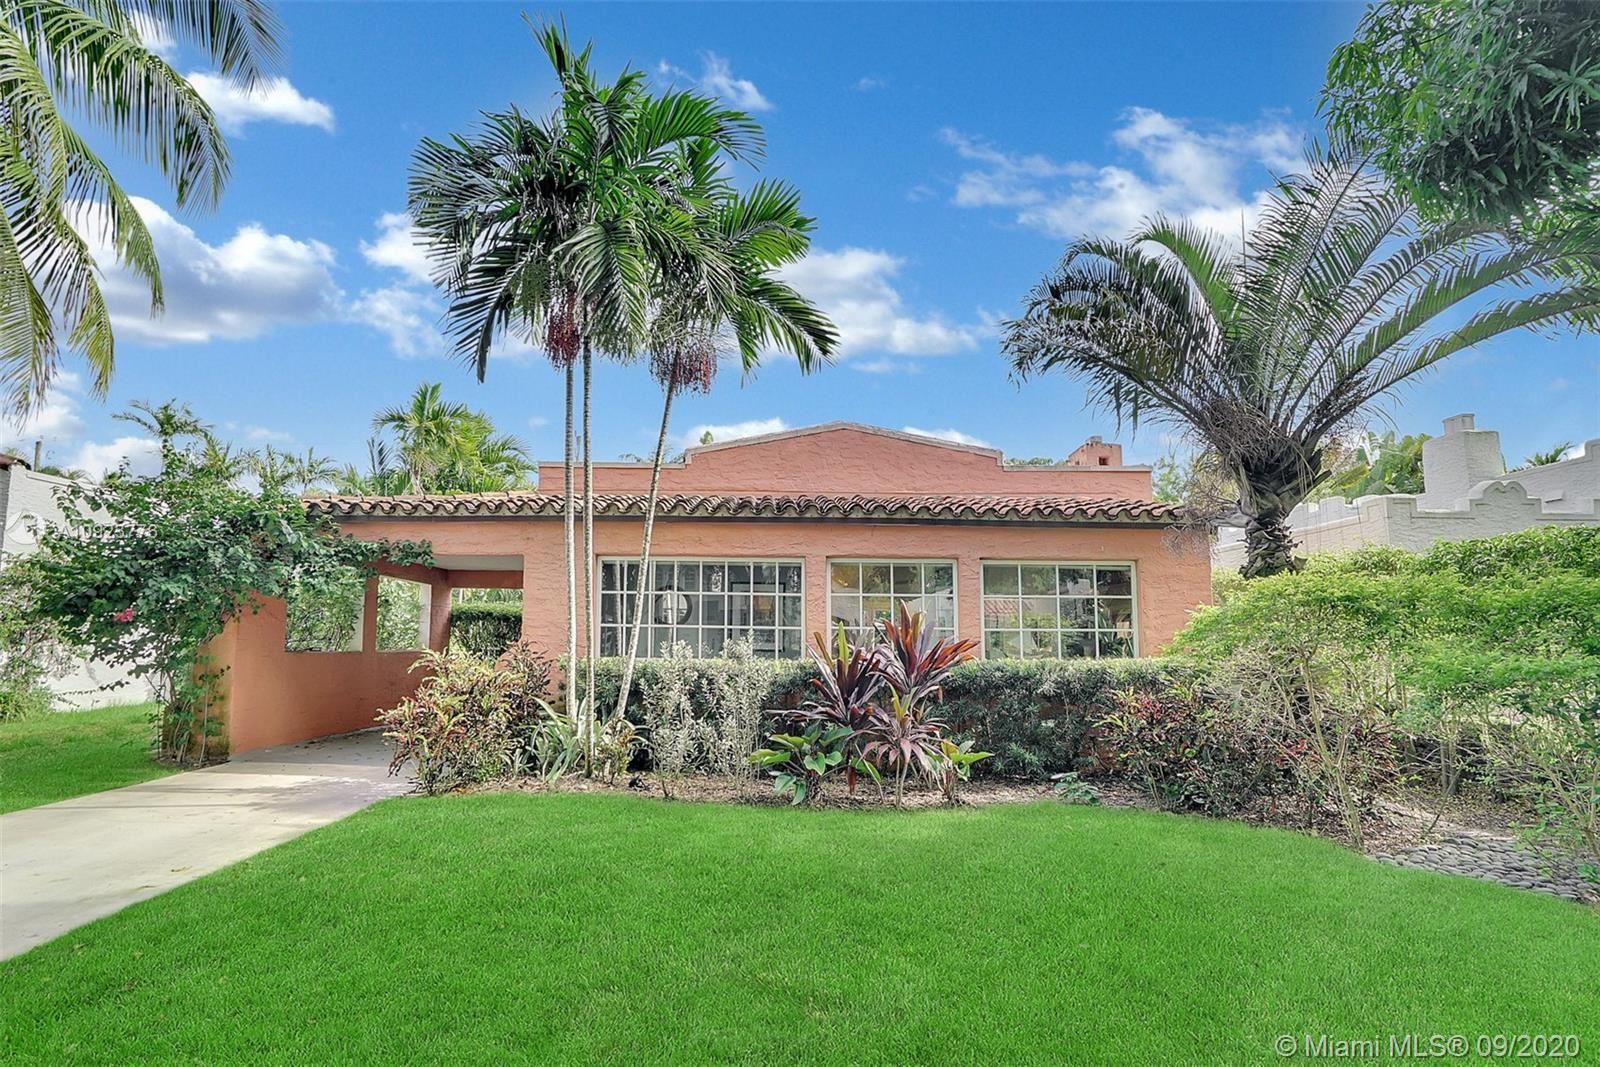 822 Milan Ave, Coral Gables, FL 33134 - #: A10923776